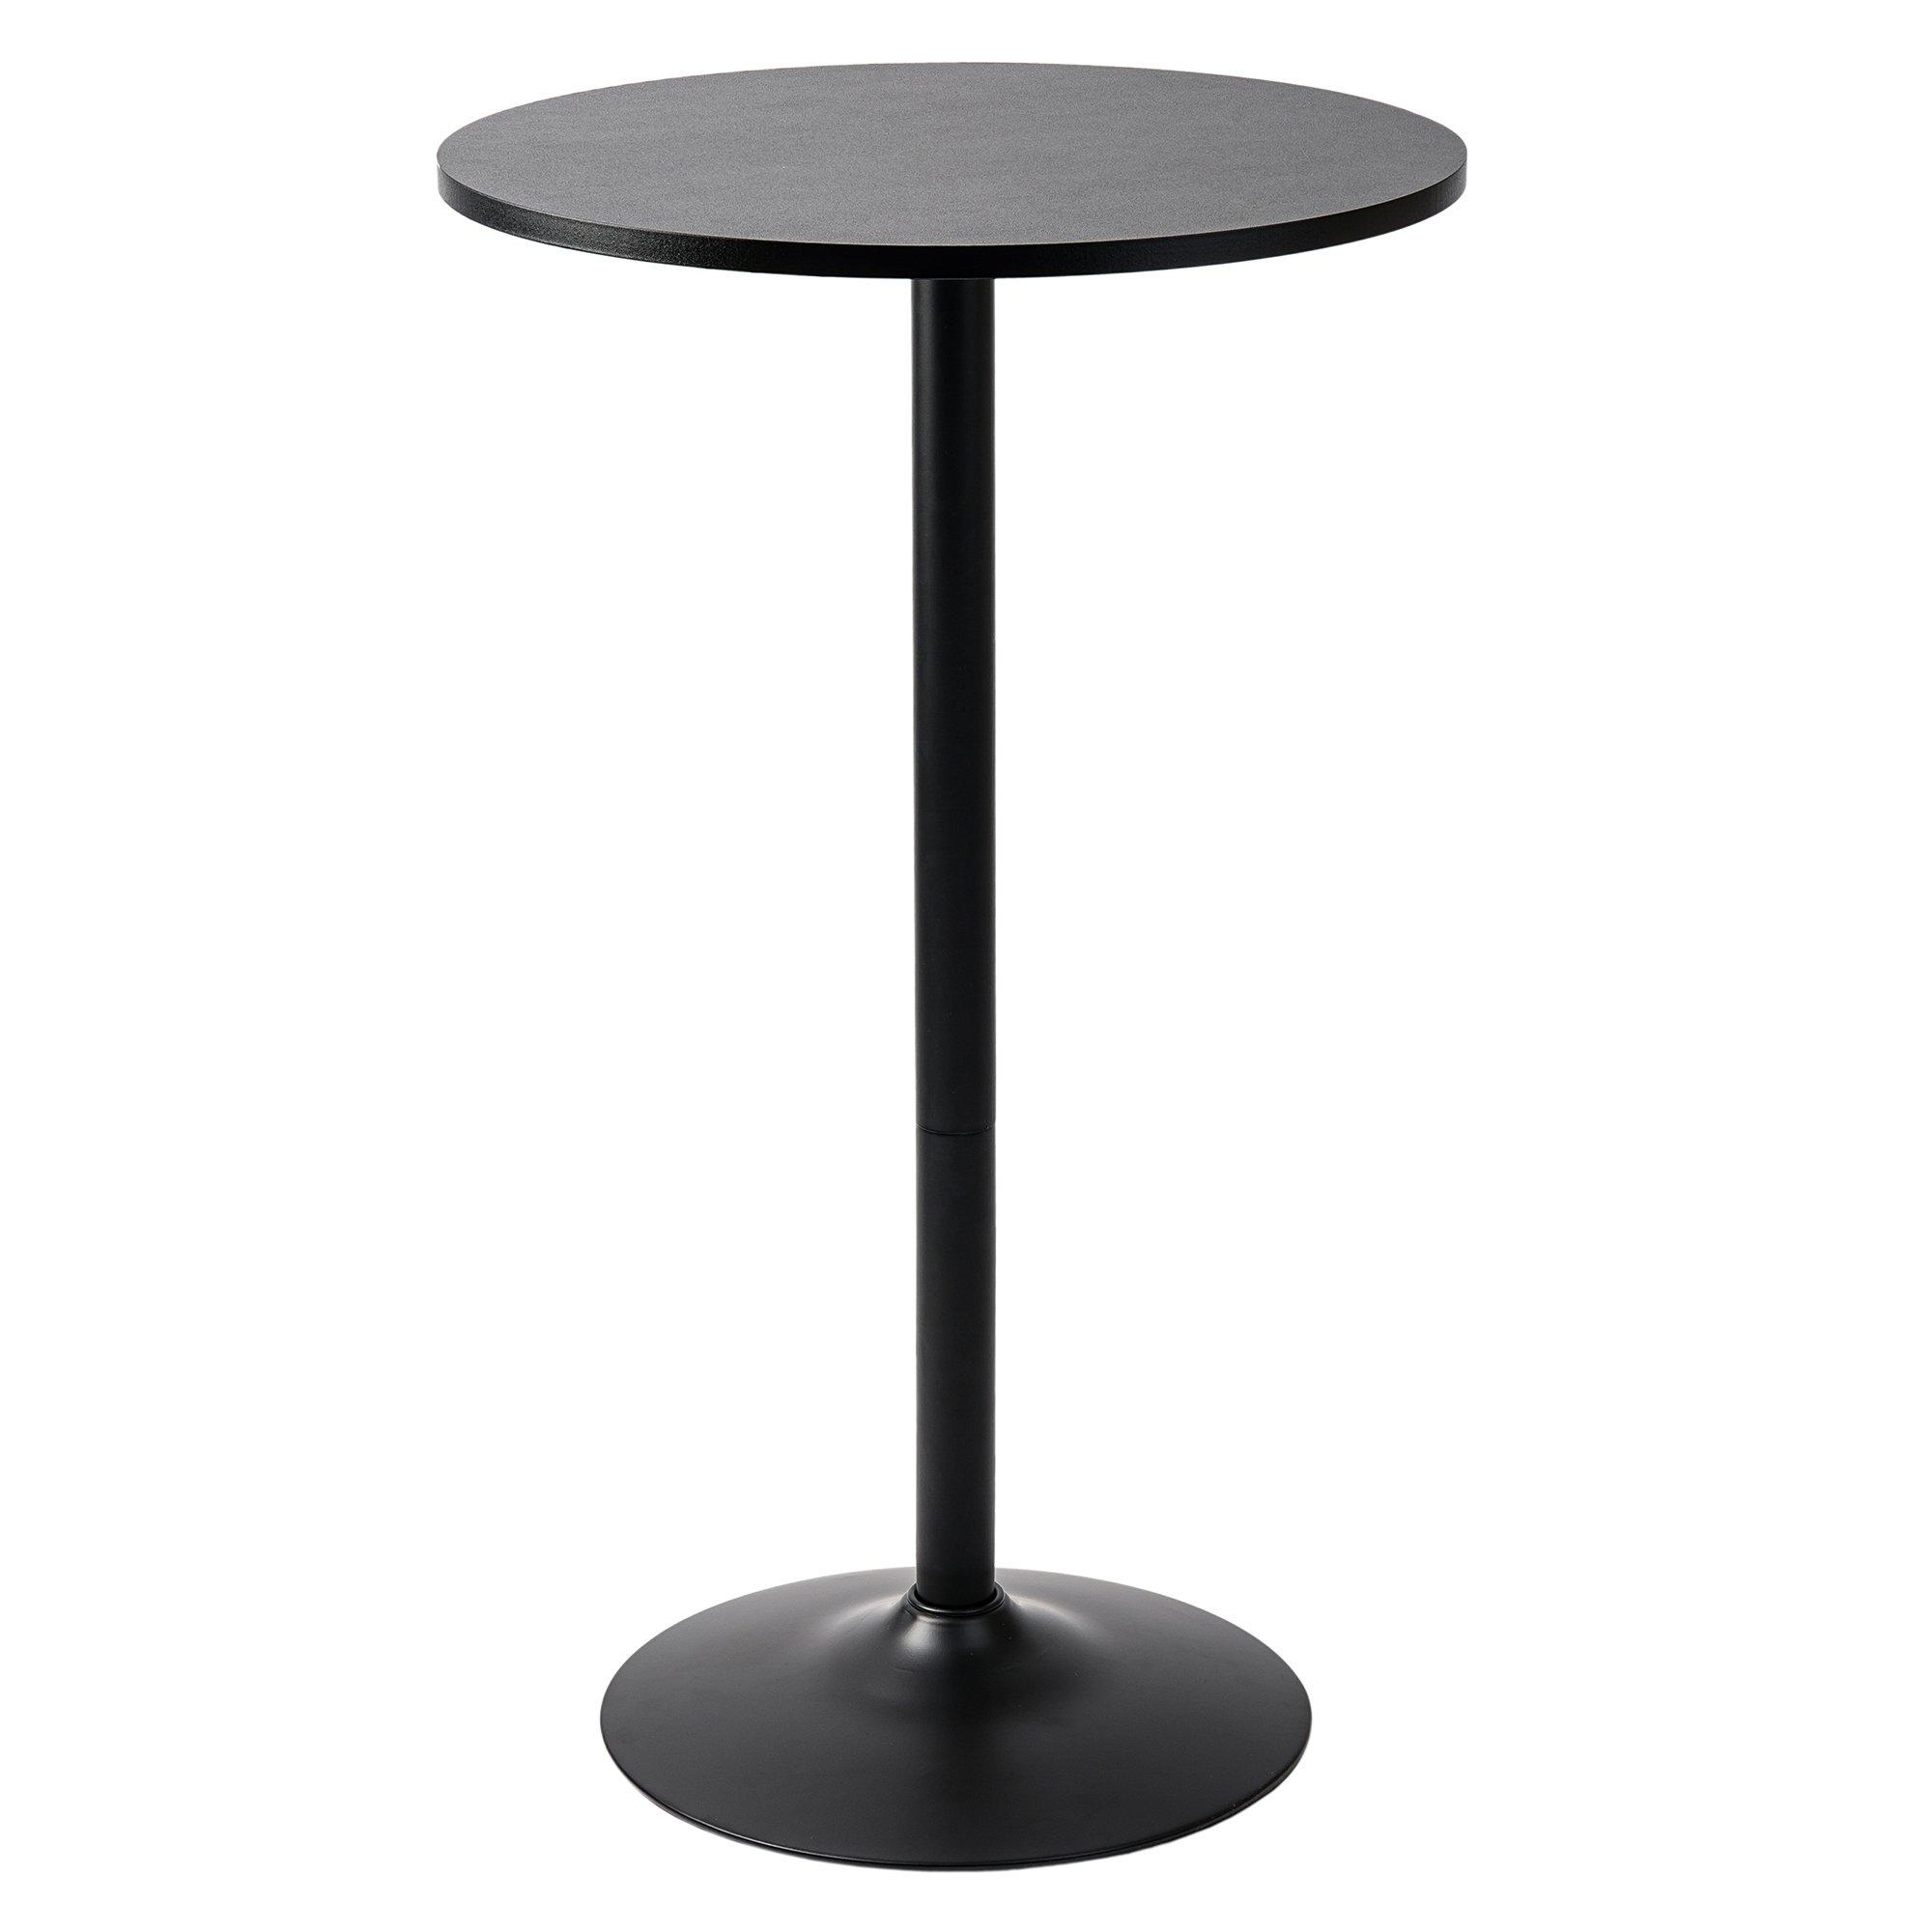 Pearington PEAR-0098 Round Bar and Pub Table, Black